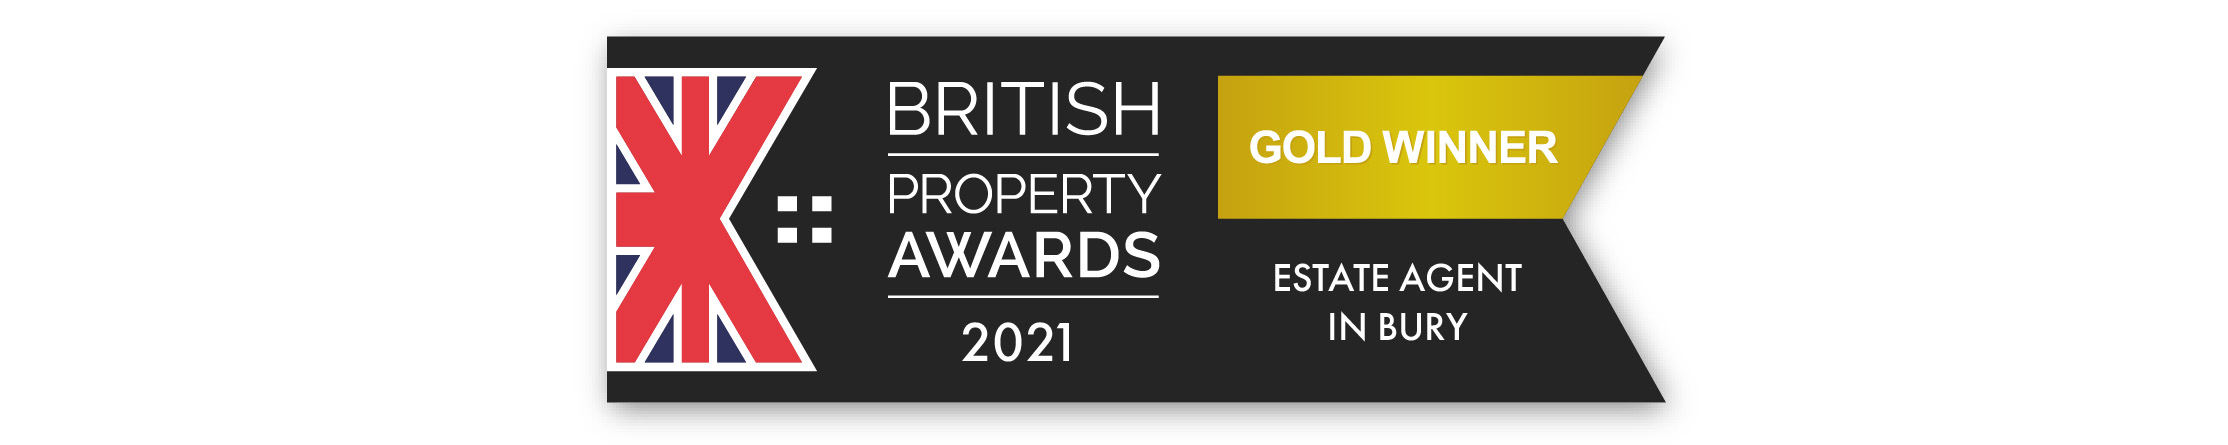 winner of british property awards 2021